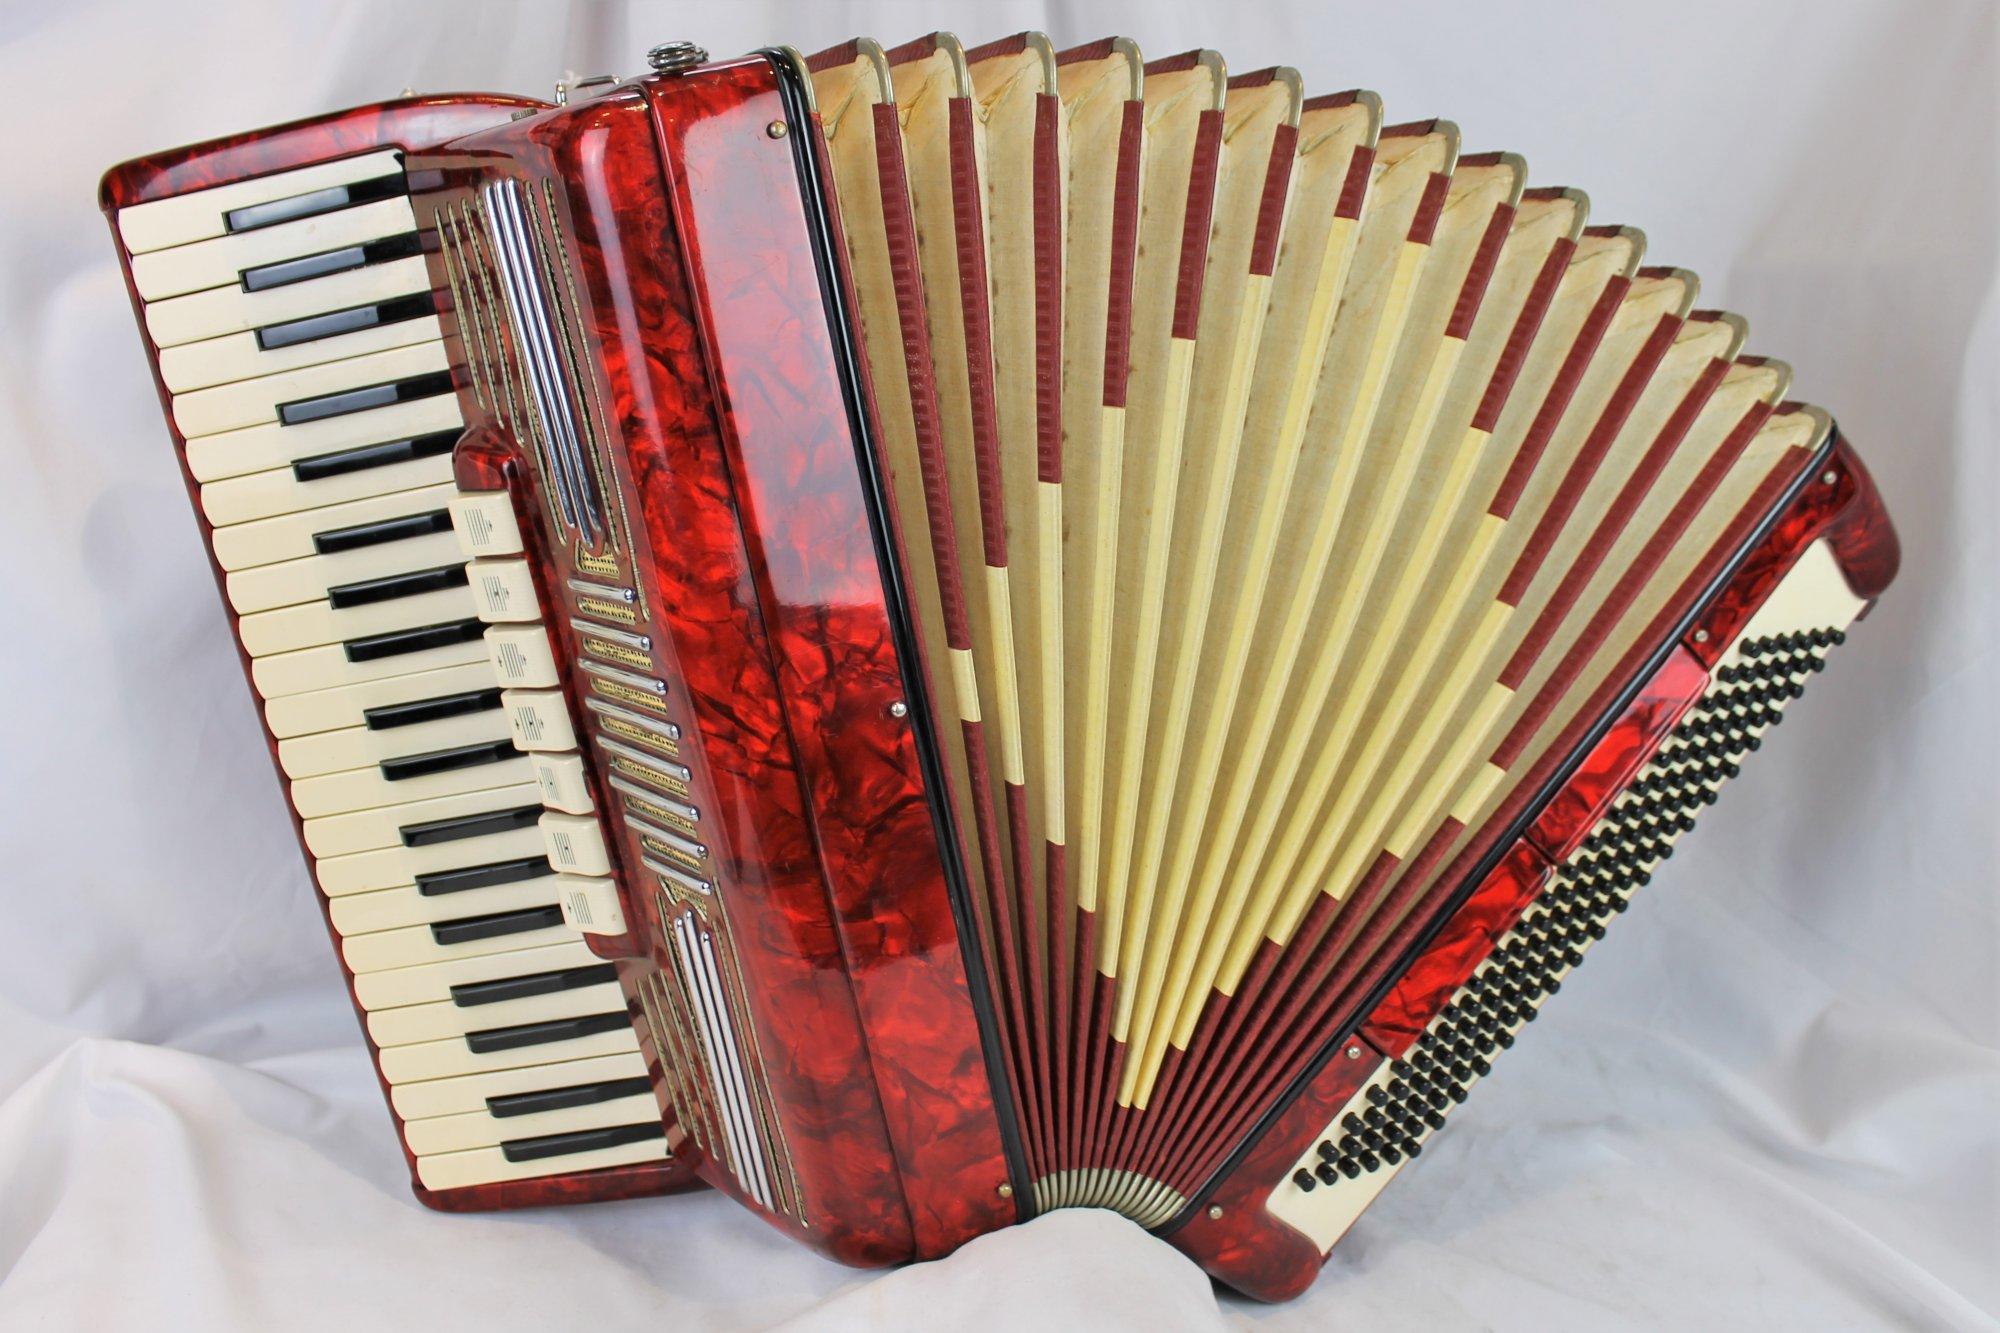 4393 - Red Italian Piano Accordion LMH 41 120